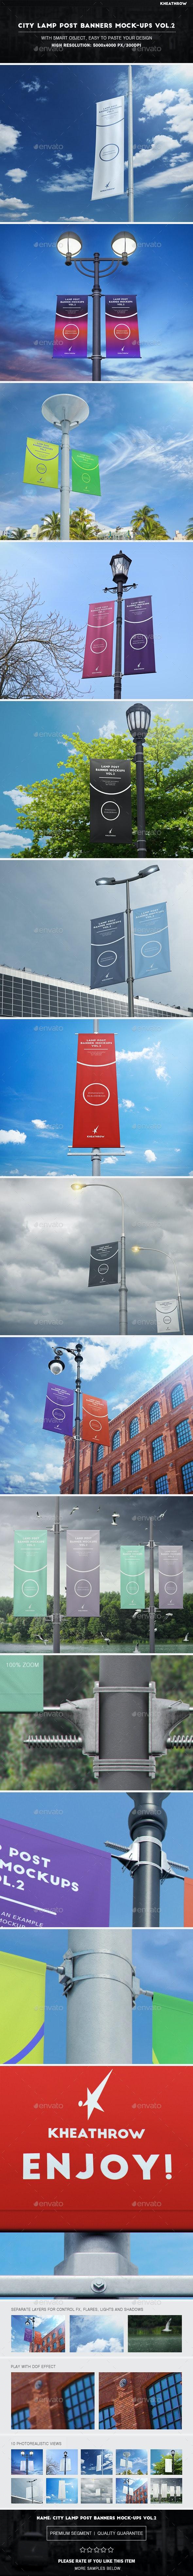 City Lamp Post Banners Mock-Ups Vol.2 - Product Mock-Ups Graphics